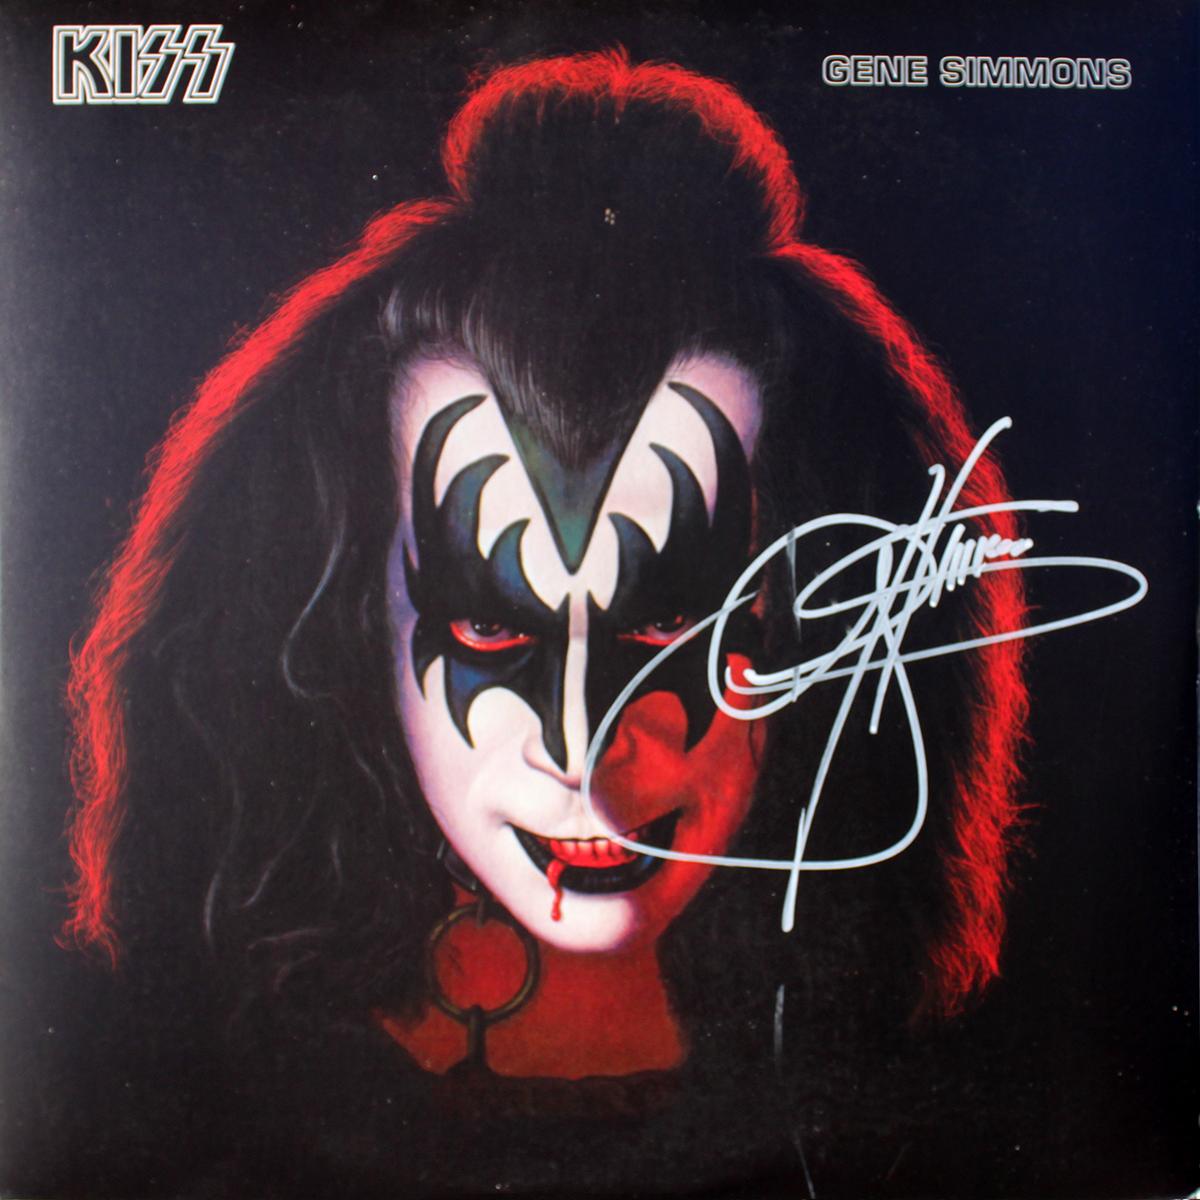 Gene Simmons - Solo Album